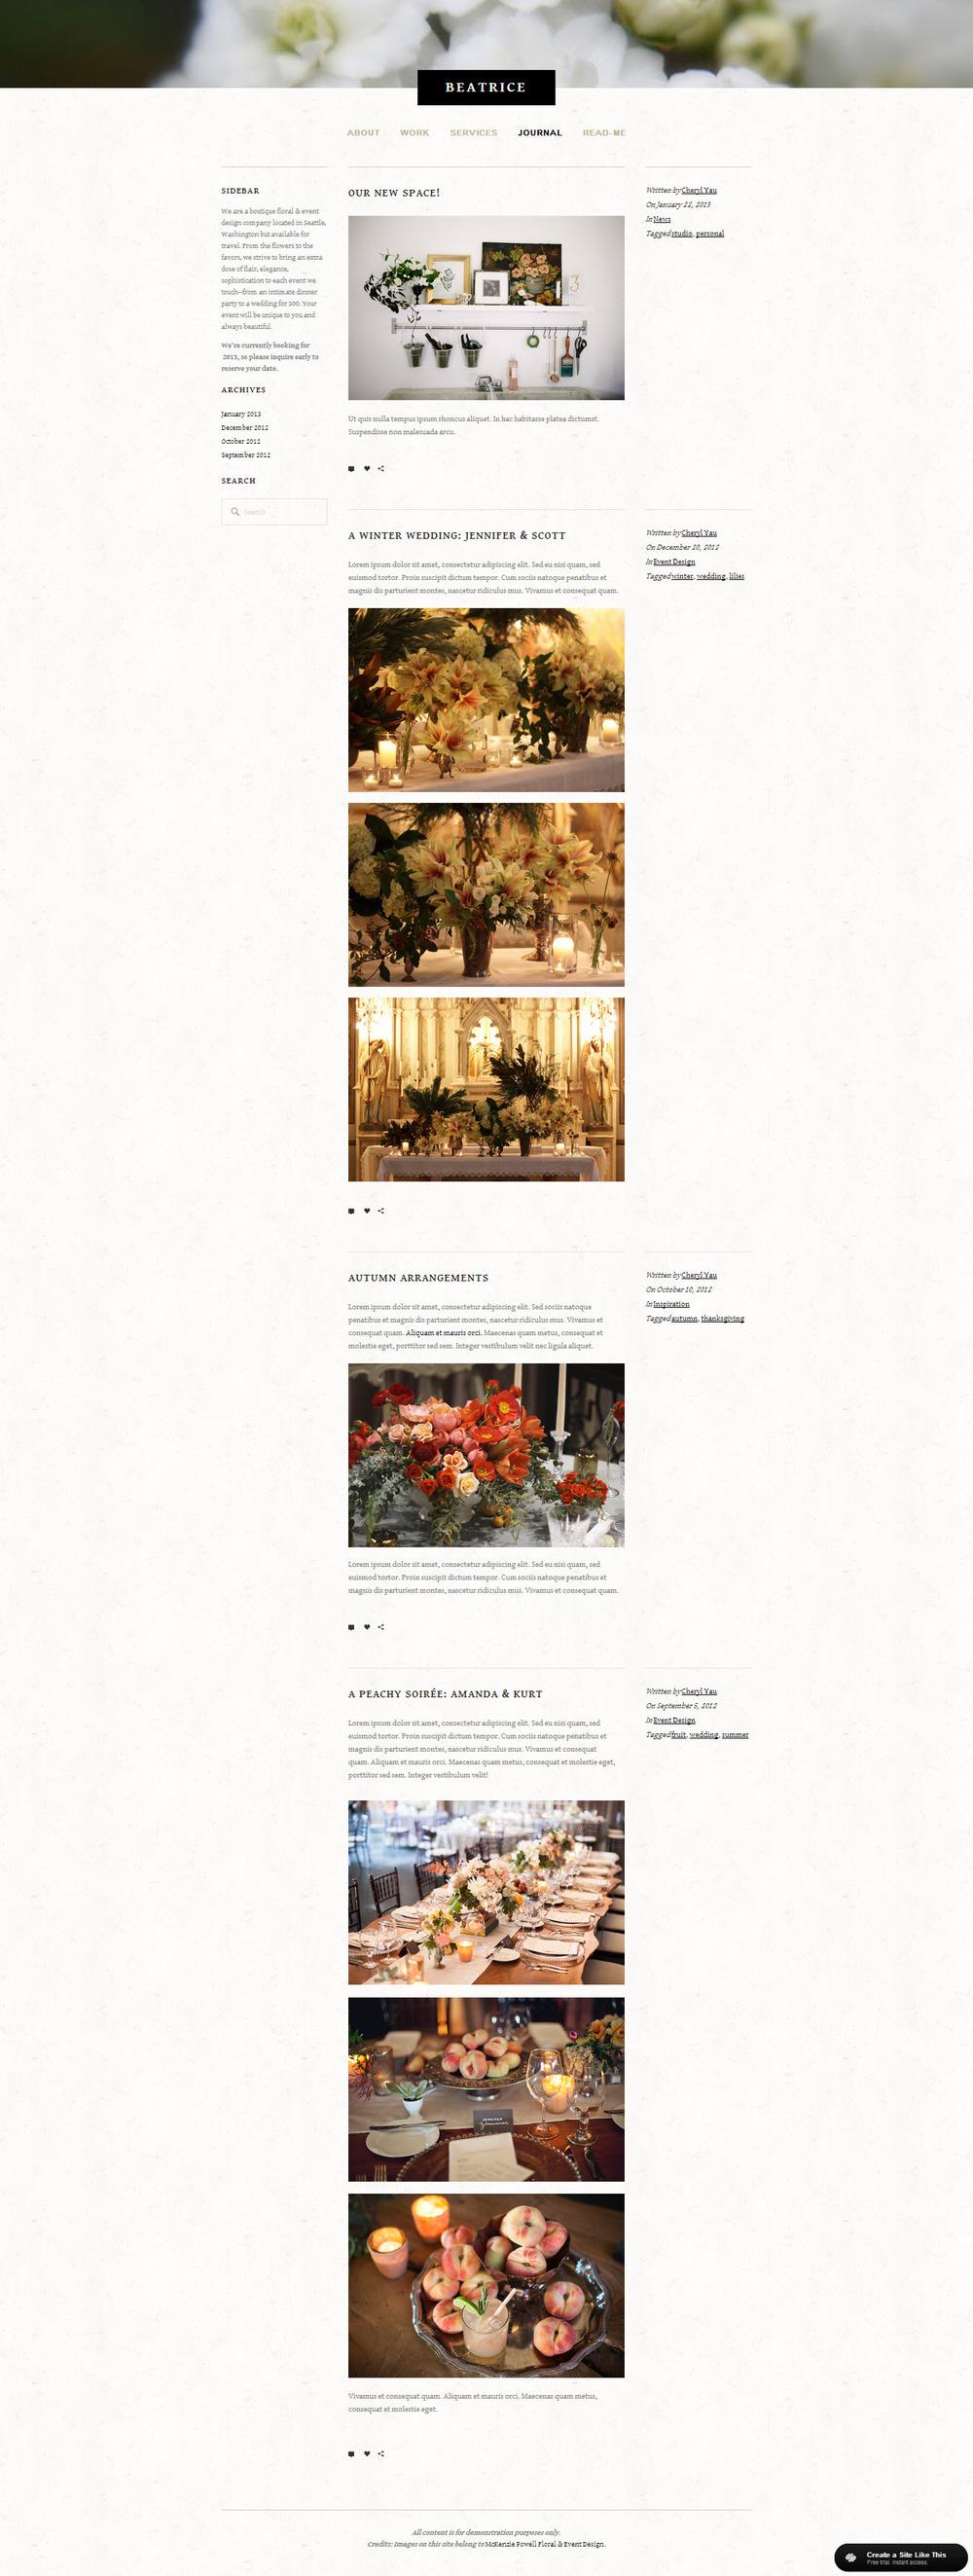 beatrice-blog.jpg